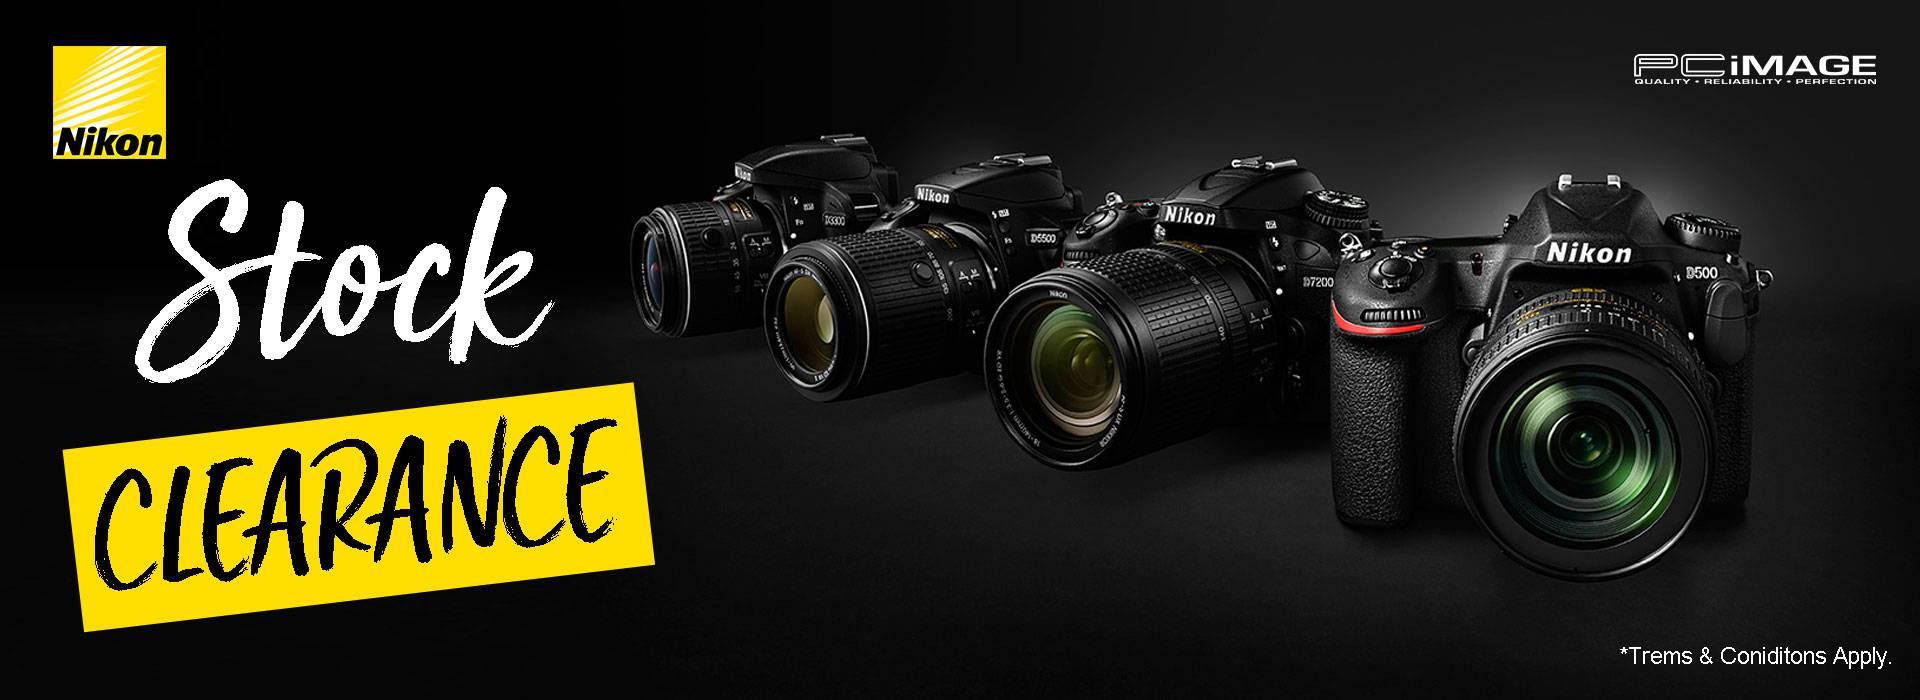 Nikon Stock Clearance